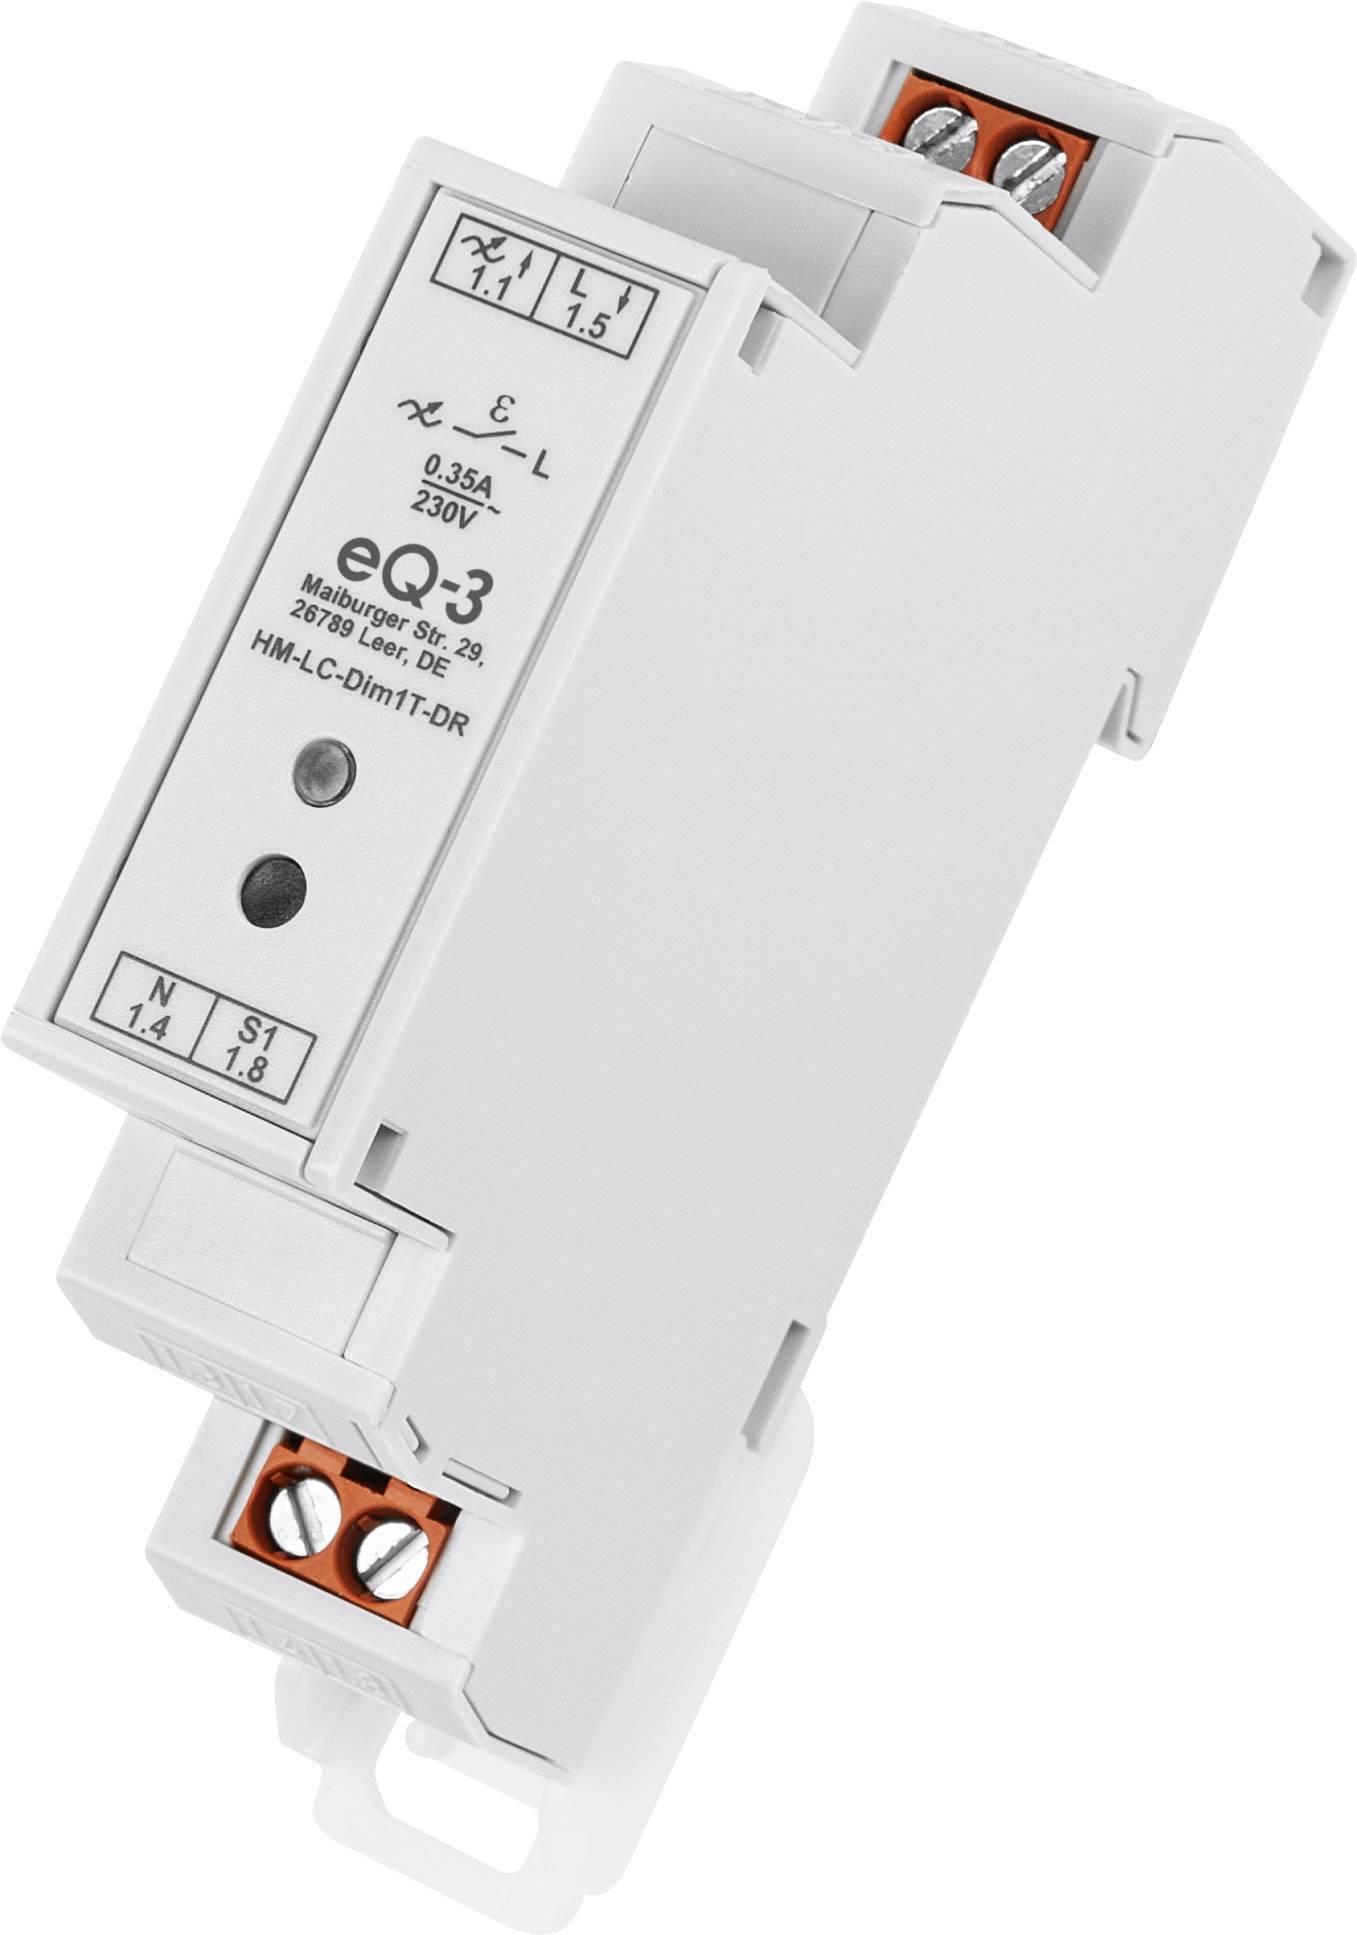 Bezdrôtový stmievač HomeMatic HM-LC-Dim1T-DR, max. dosah 140 m, 80 W